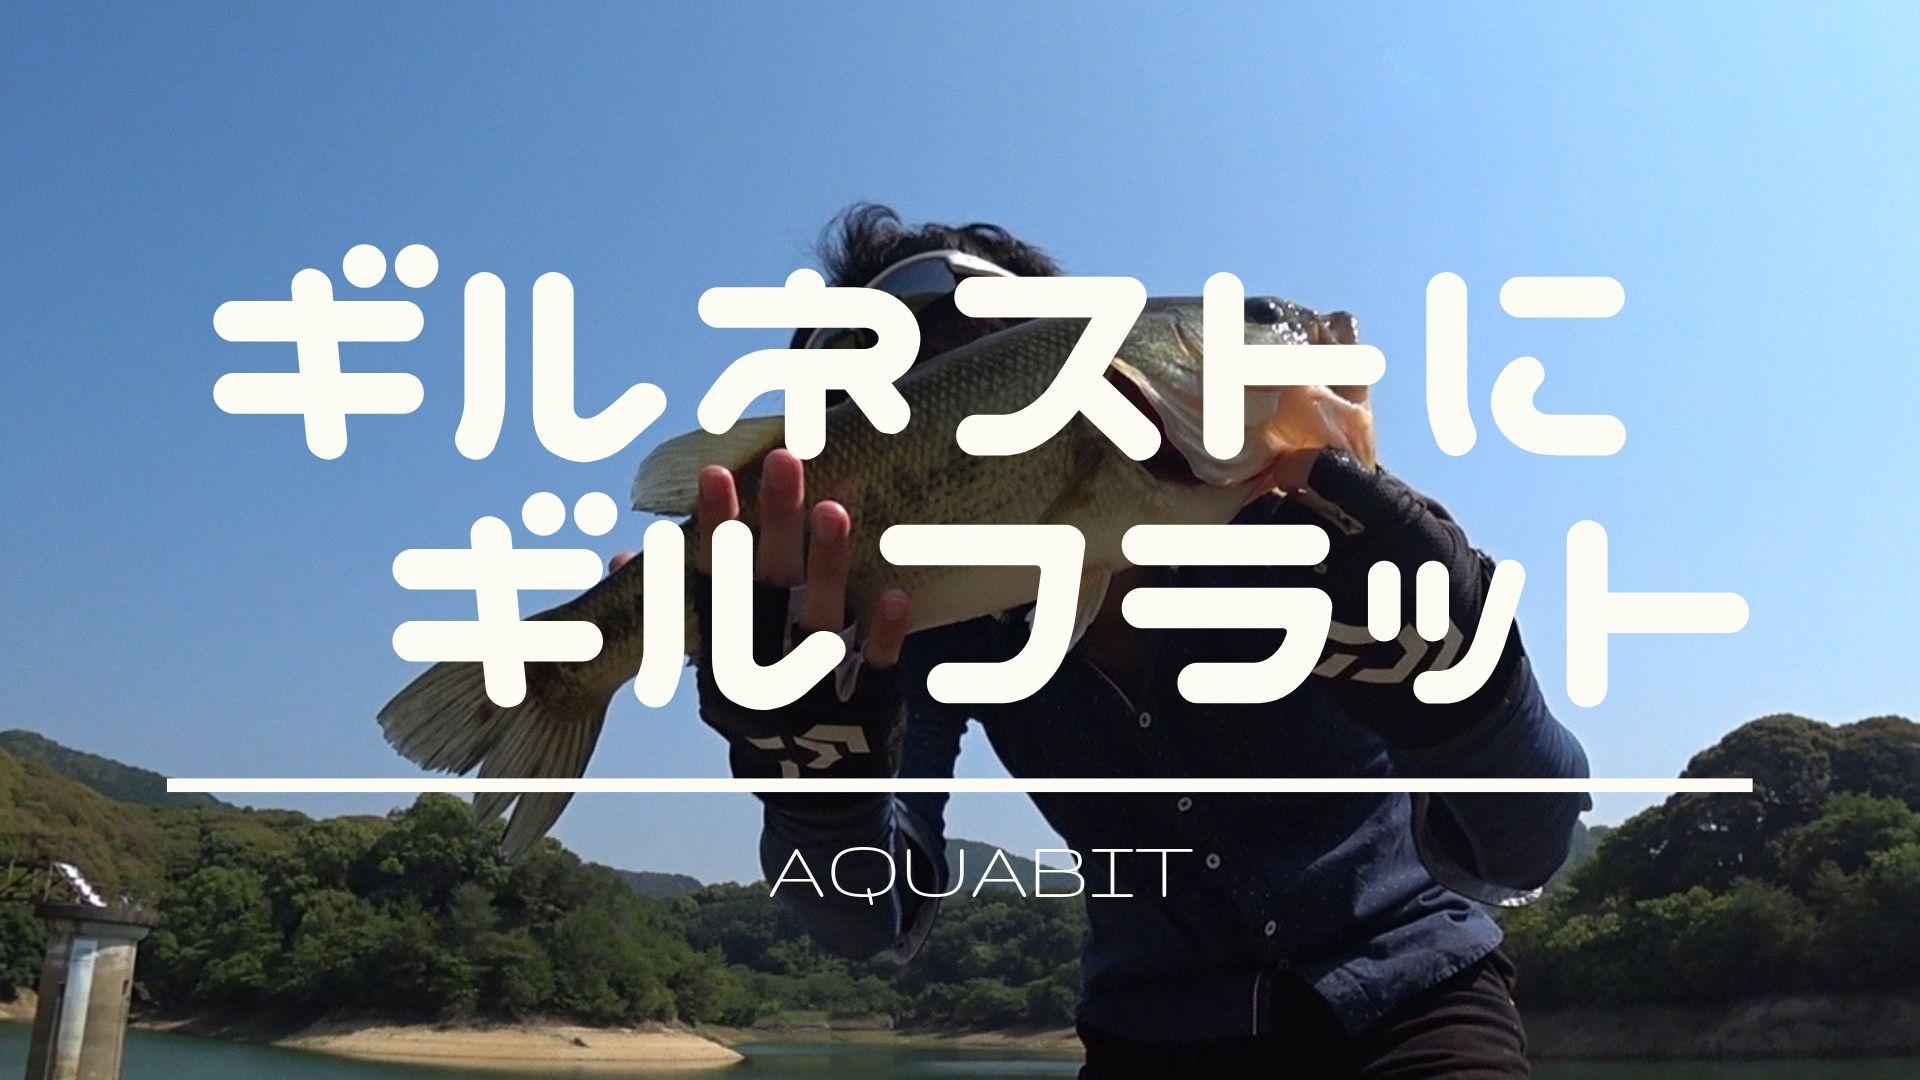 【Youtube】ギルネストにデカバスを発見!isseiギルフラットで勝負に挑んだ動画をアップ!!